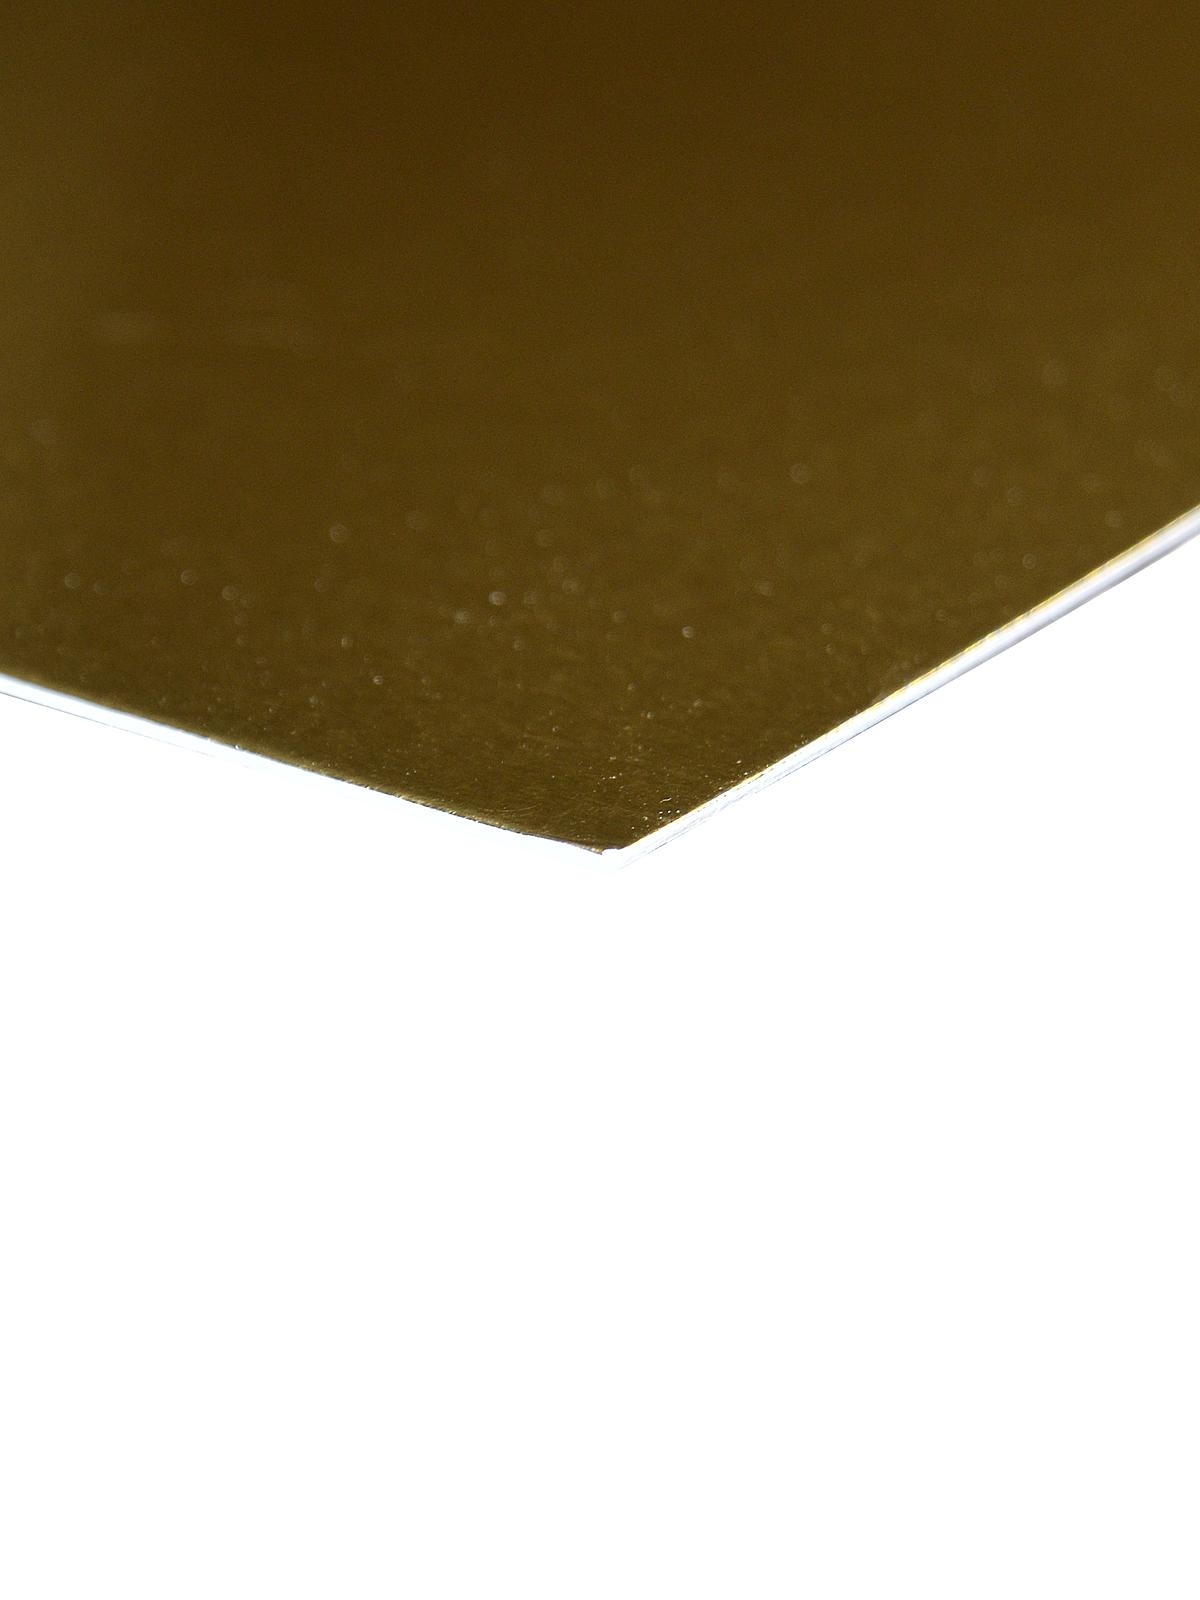 photo club michaels mvktv mats board matting matte mat sizes boards